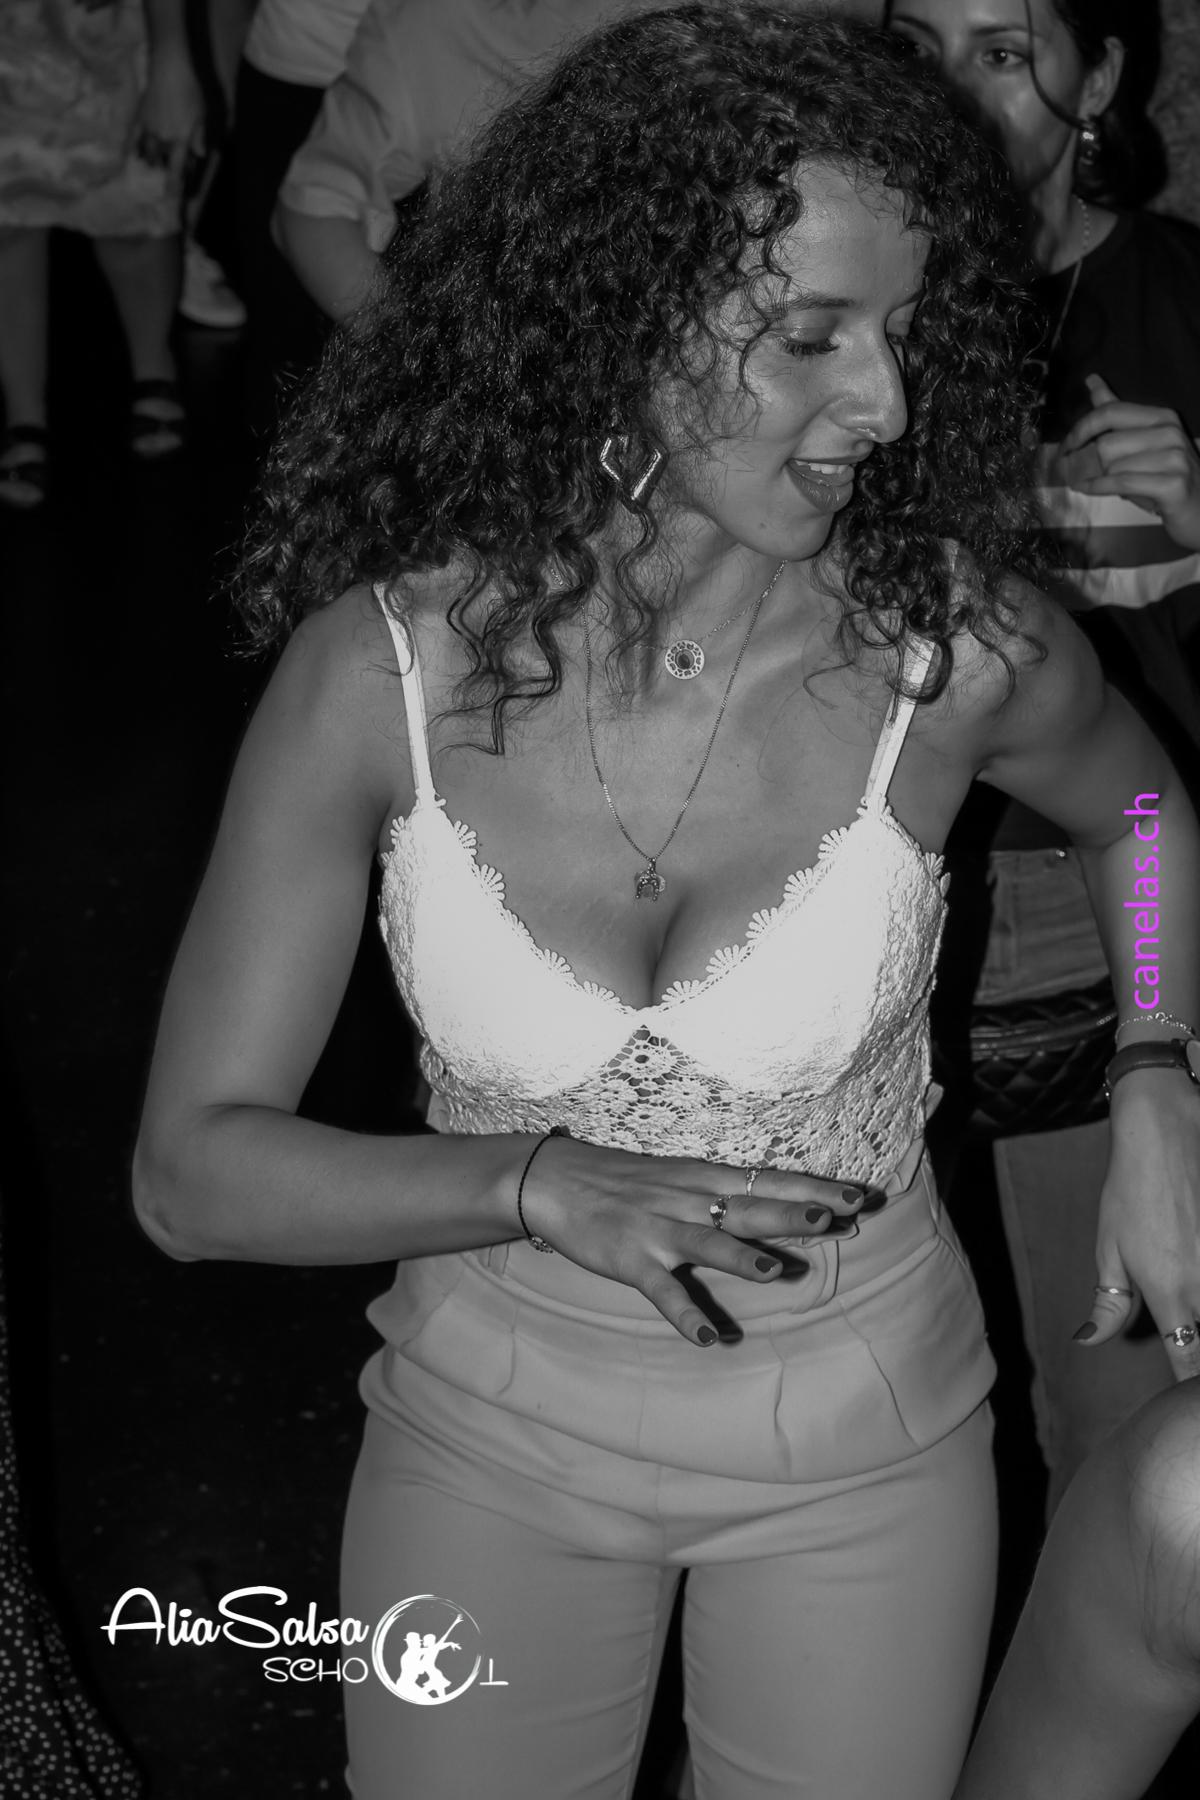 AliaSalsa ecole de danse lausanne soiree bachata salsa cubaineAlia Salsa Soireé Salsa - Bachata-7